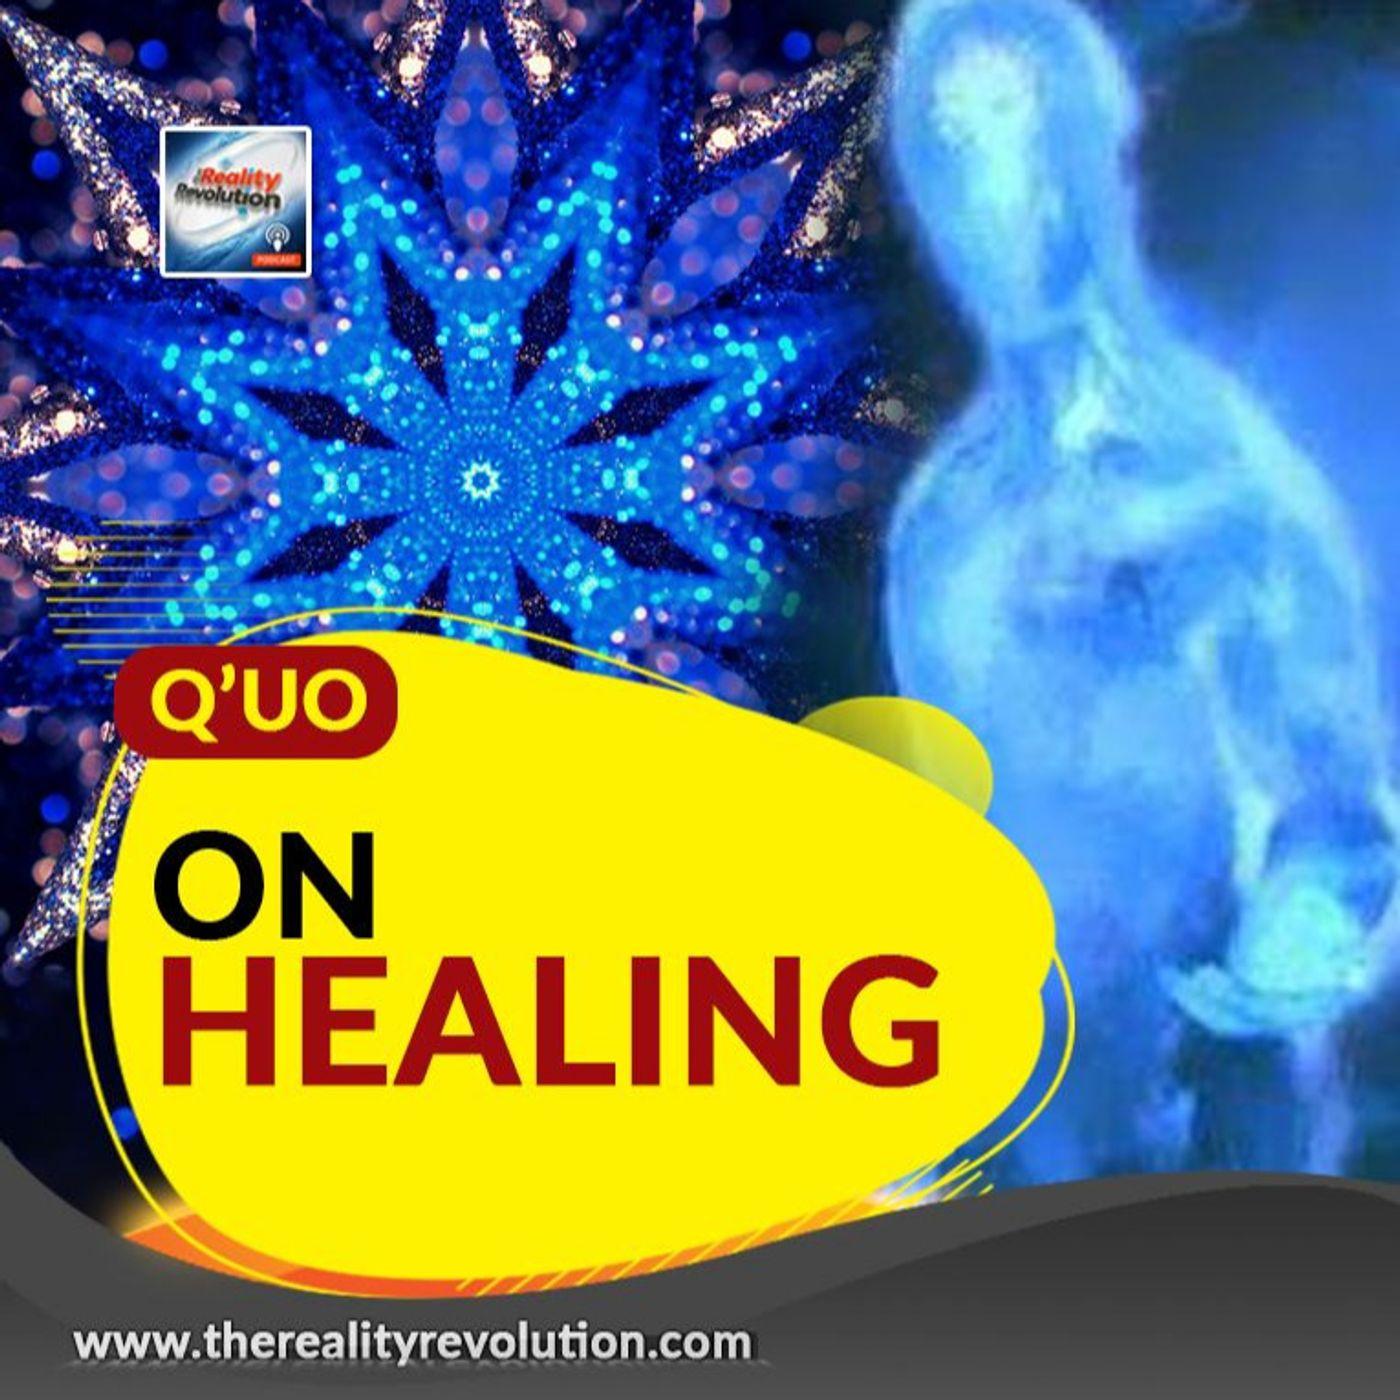 Q'uo On Healing